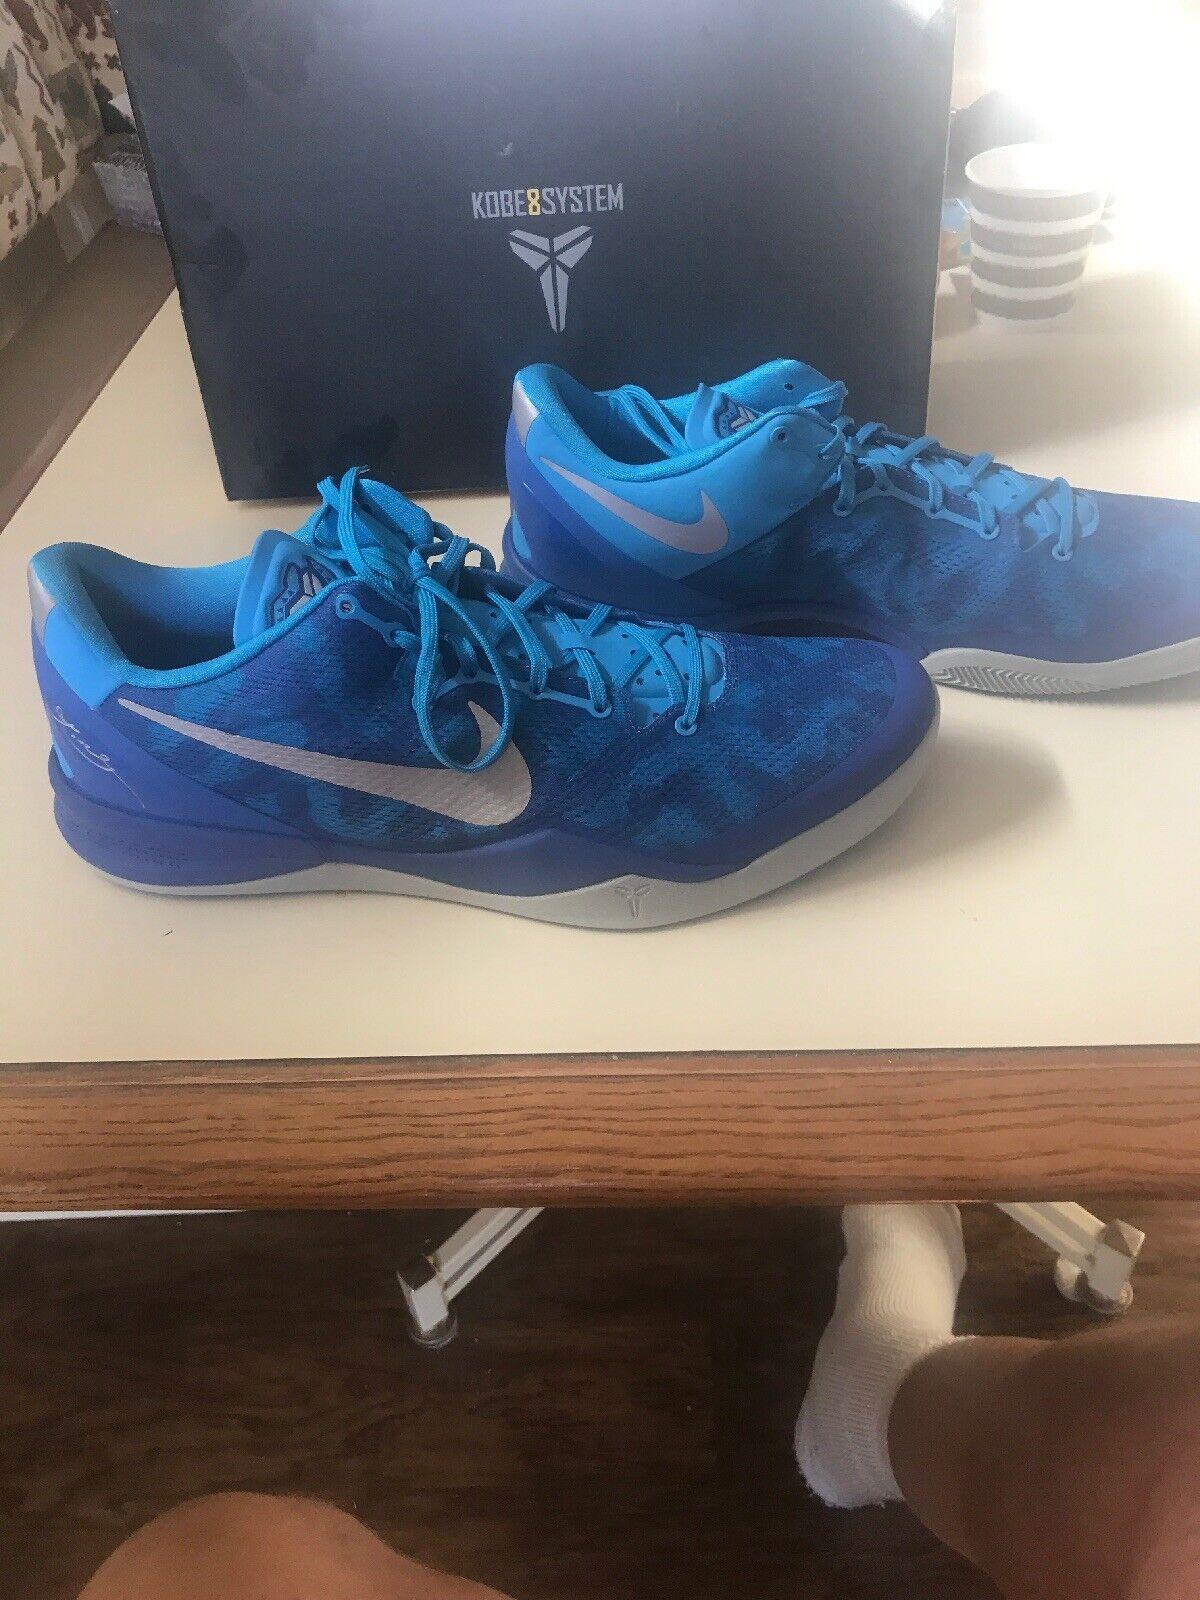 NIKE Kobe 8 VIII System bluee Snake shoes SZ. 15 New In Box